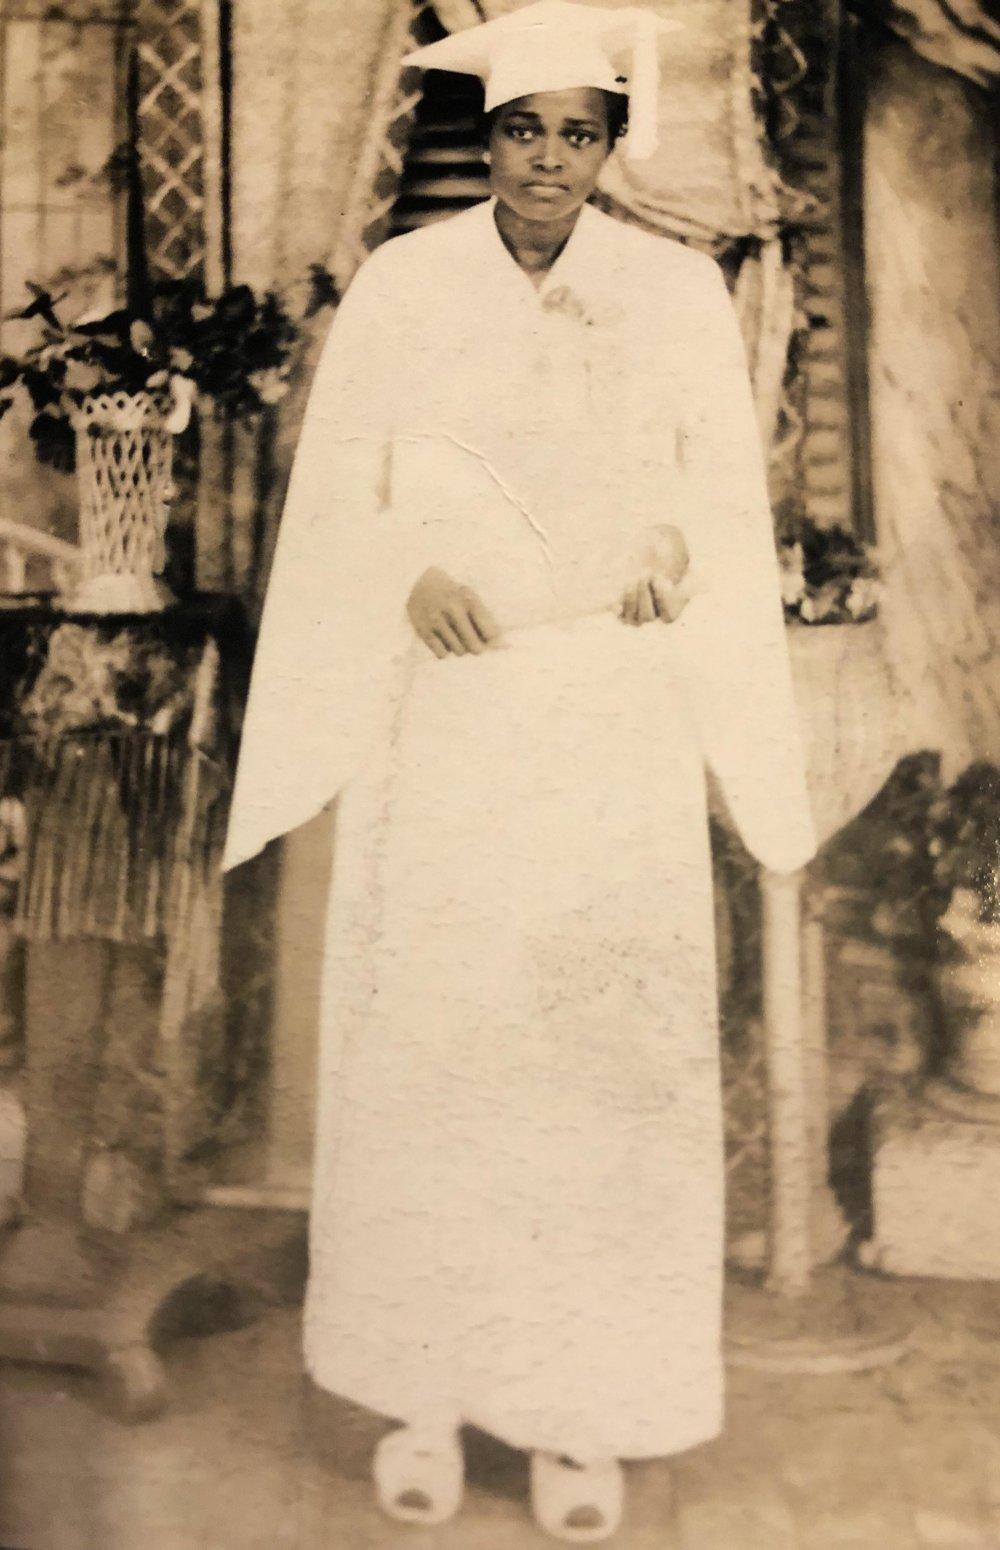 My Maternal Grandmother - Daisy Photo by Reyno Studios